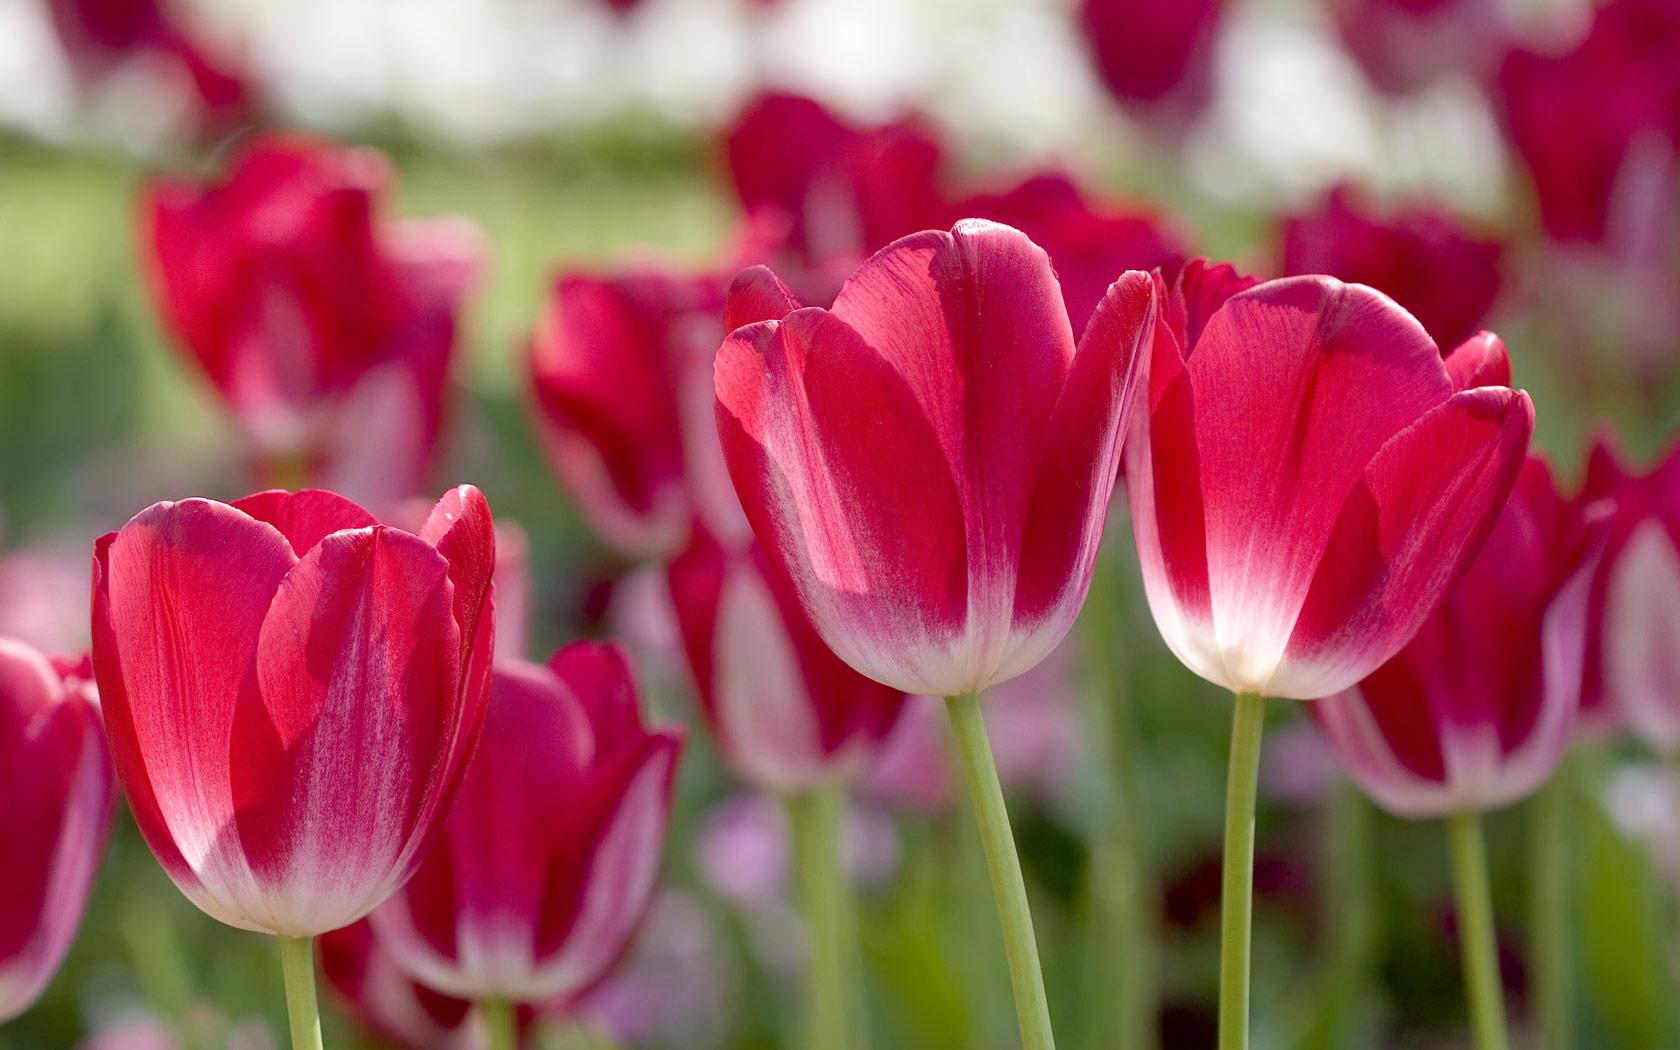 Description Spring Flowers HD is a hi res Wallpaper for pc desktops 1680x1050